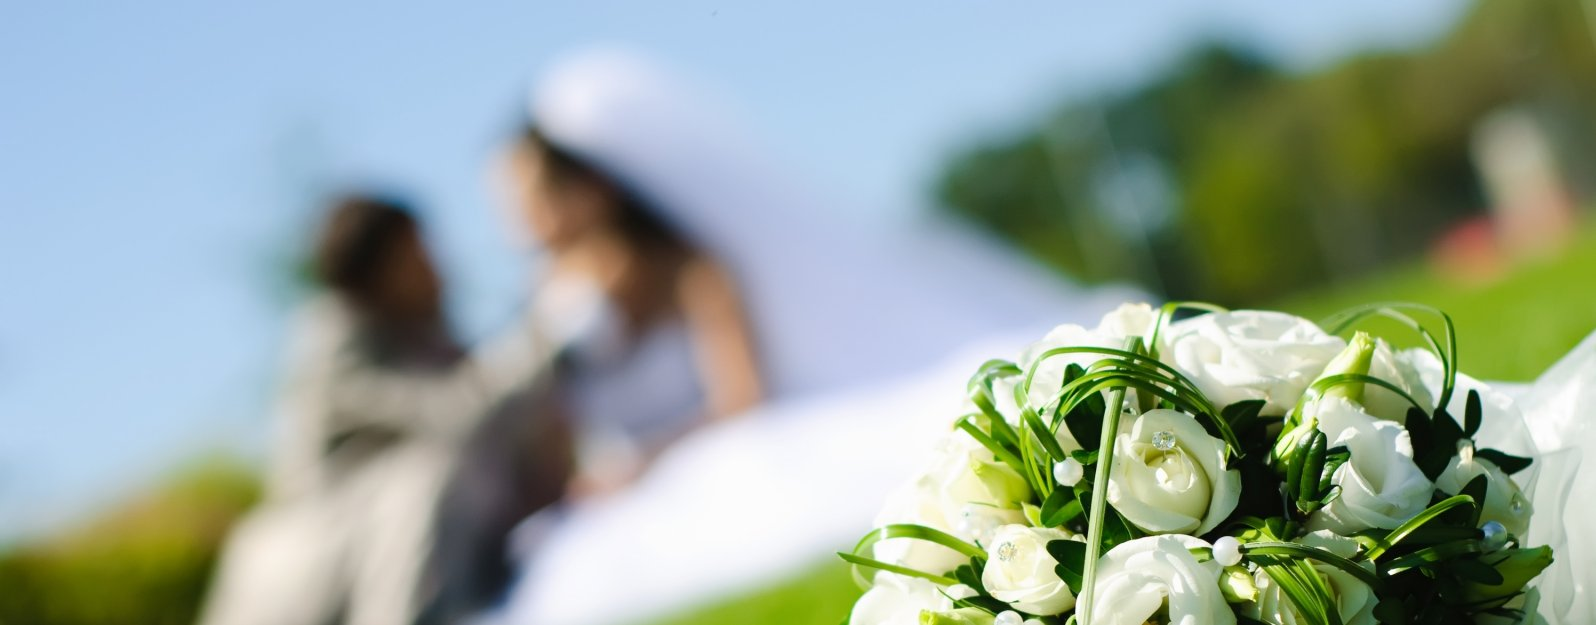 Video di sposi nel giardino